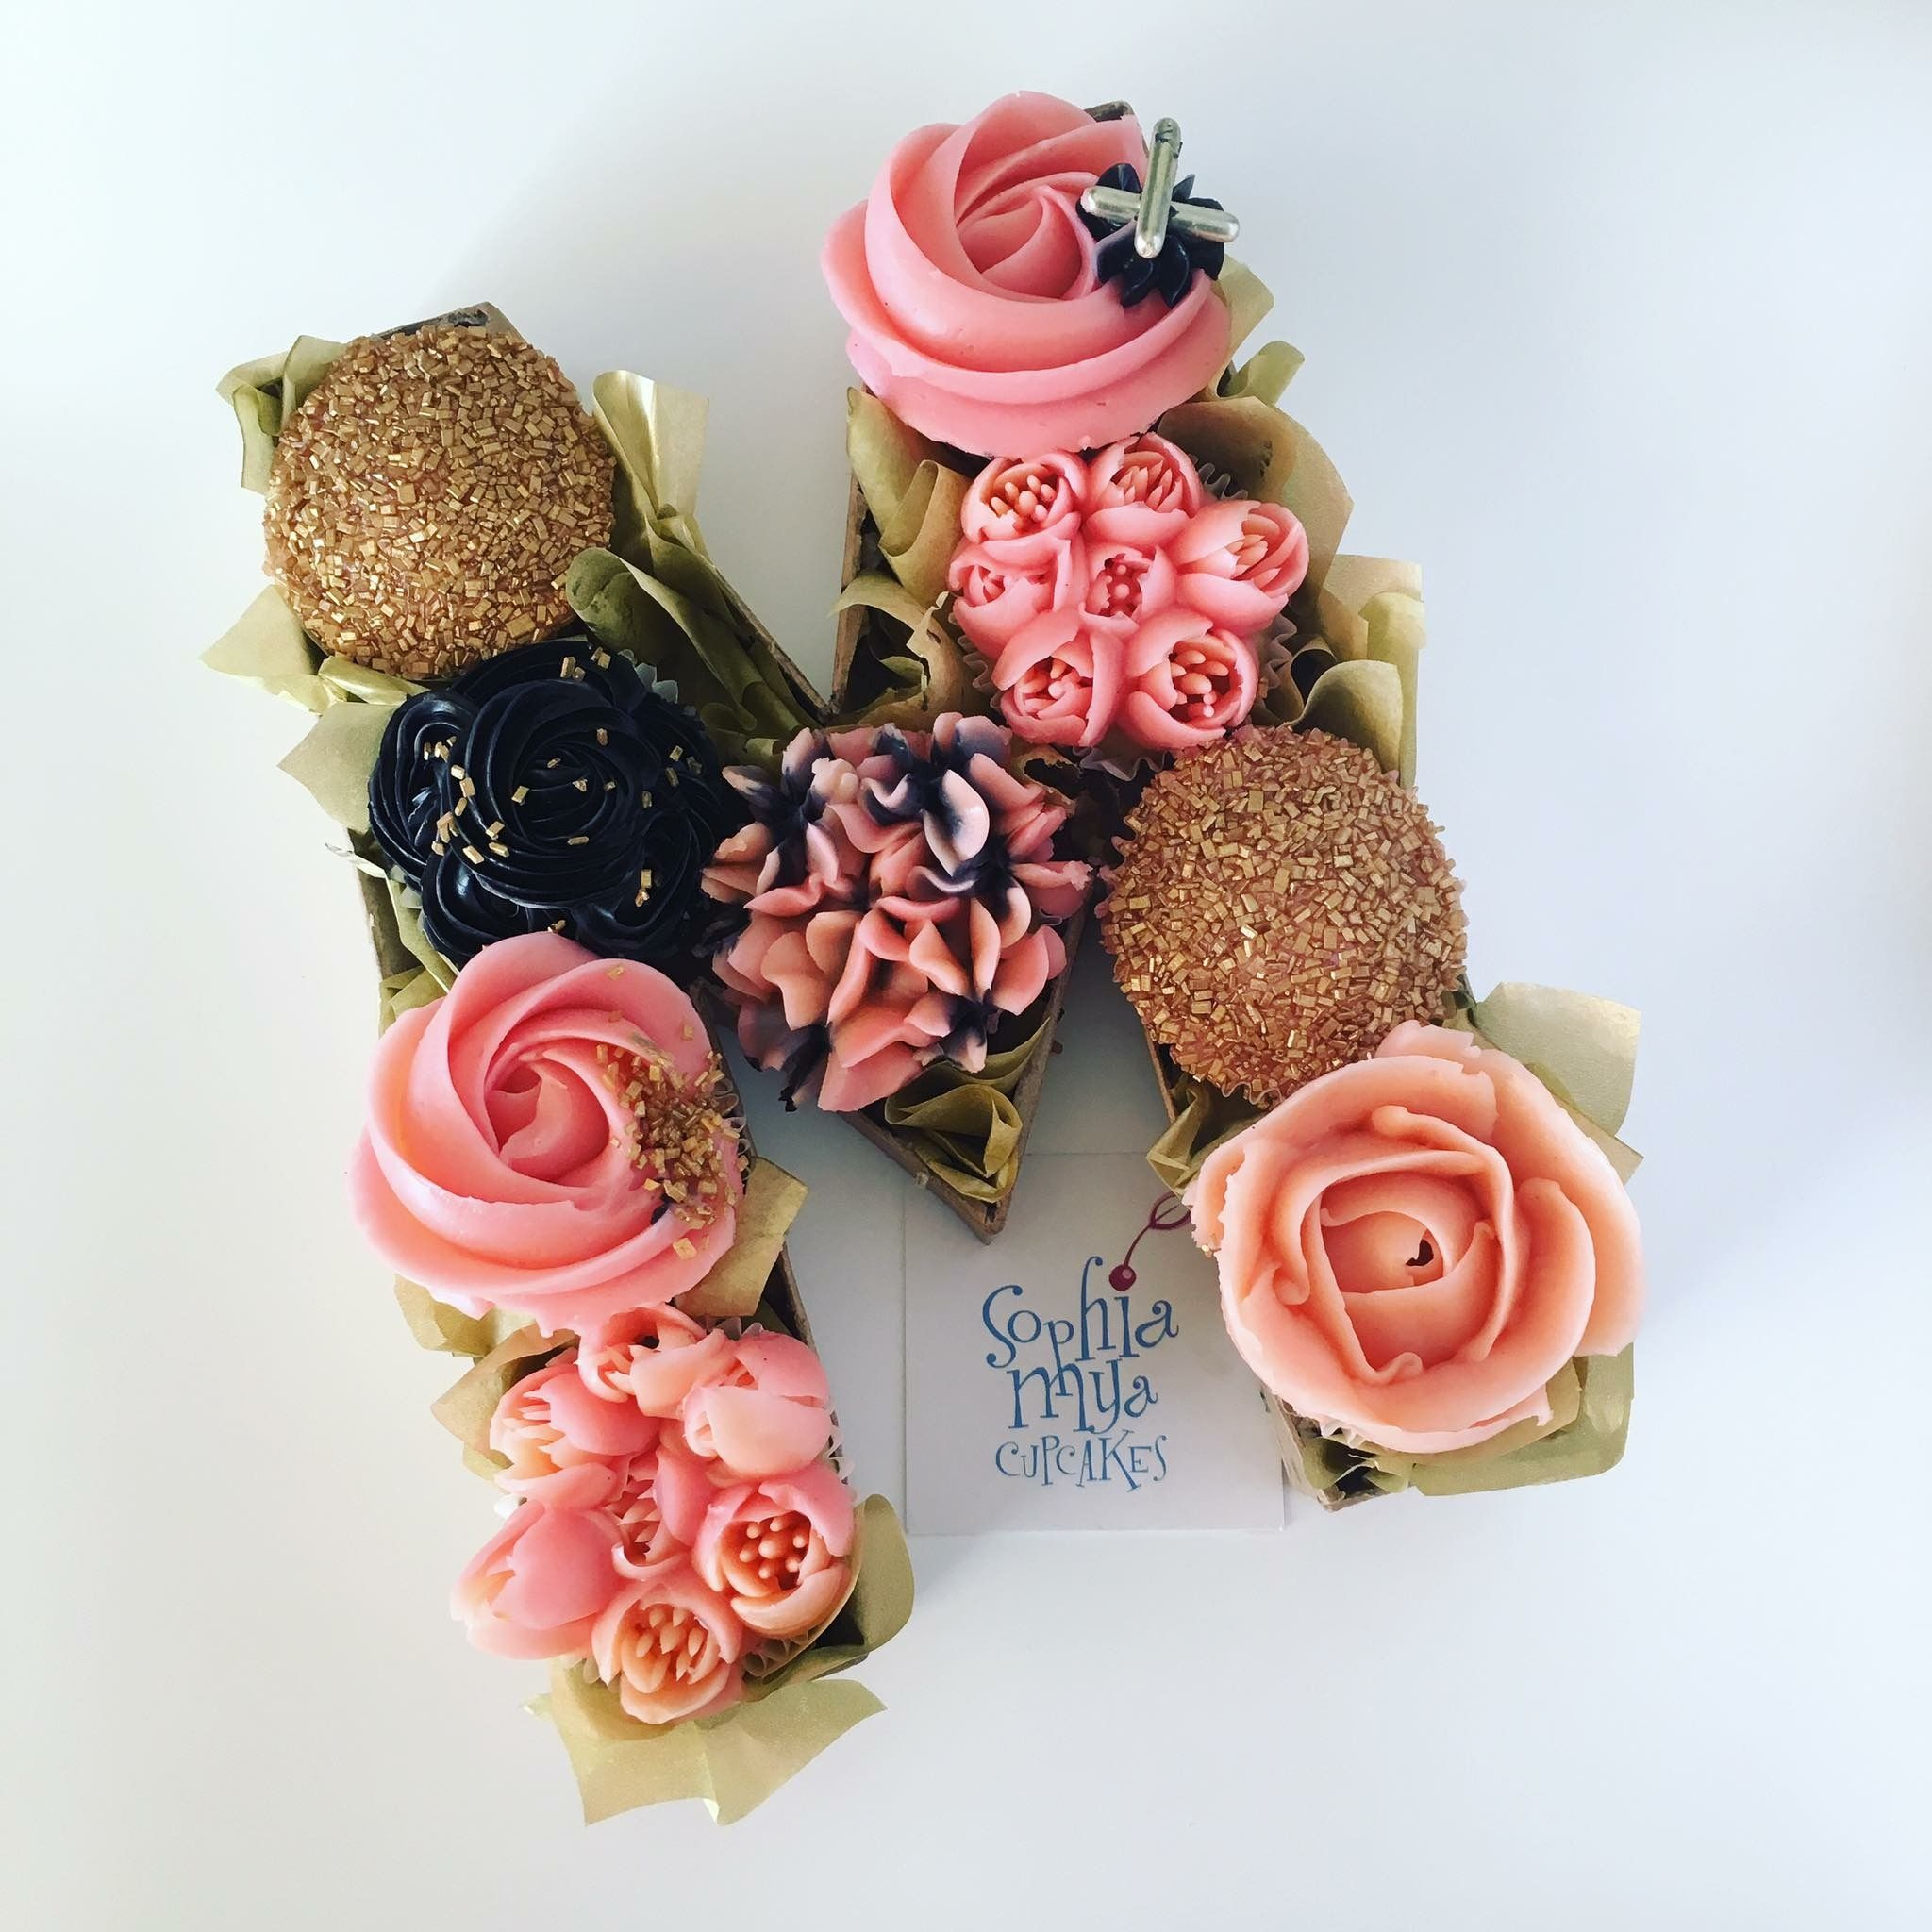 Cupcake monogram concept design by sophia mya cupcakes cakes cupcake artistnina sophiamyacupcakes instagram photos and videos izmirmasajfo Image collections